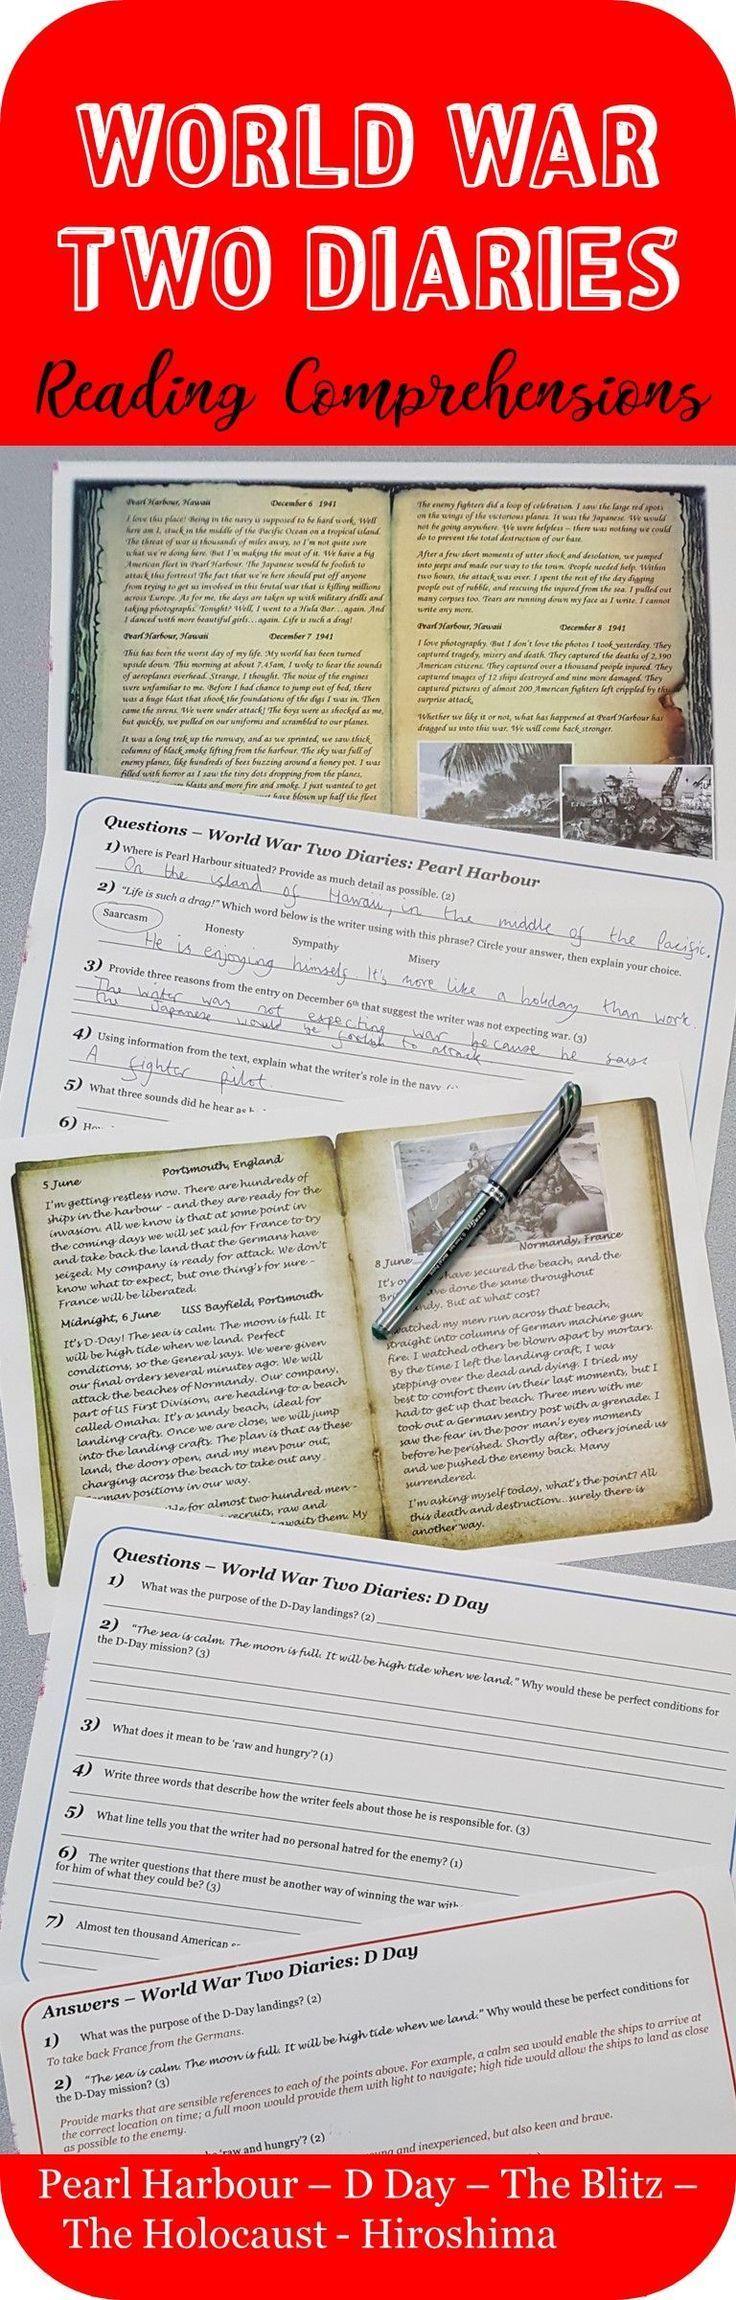 Holocaust Reading Comprehension Worksheet Nidecmege [ 2300 x 736 Pixel ]